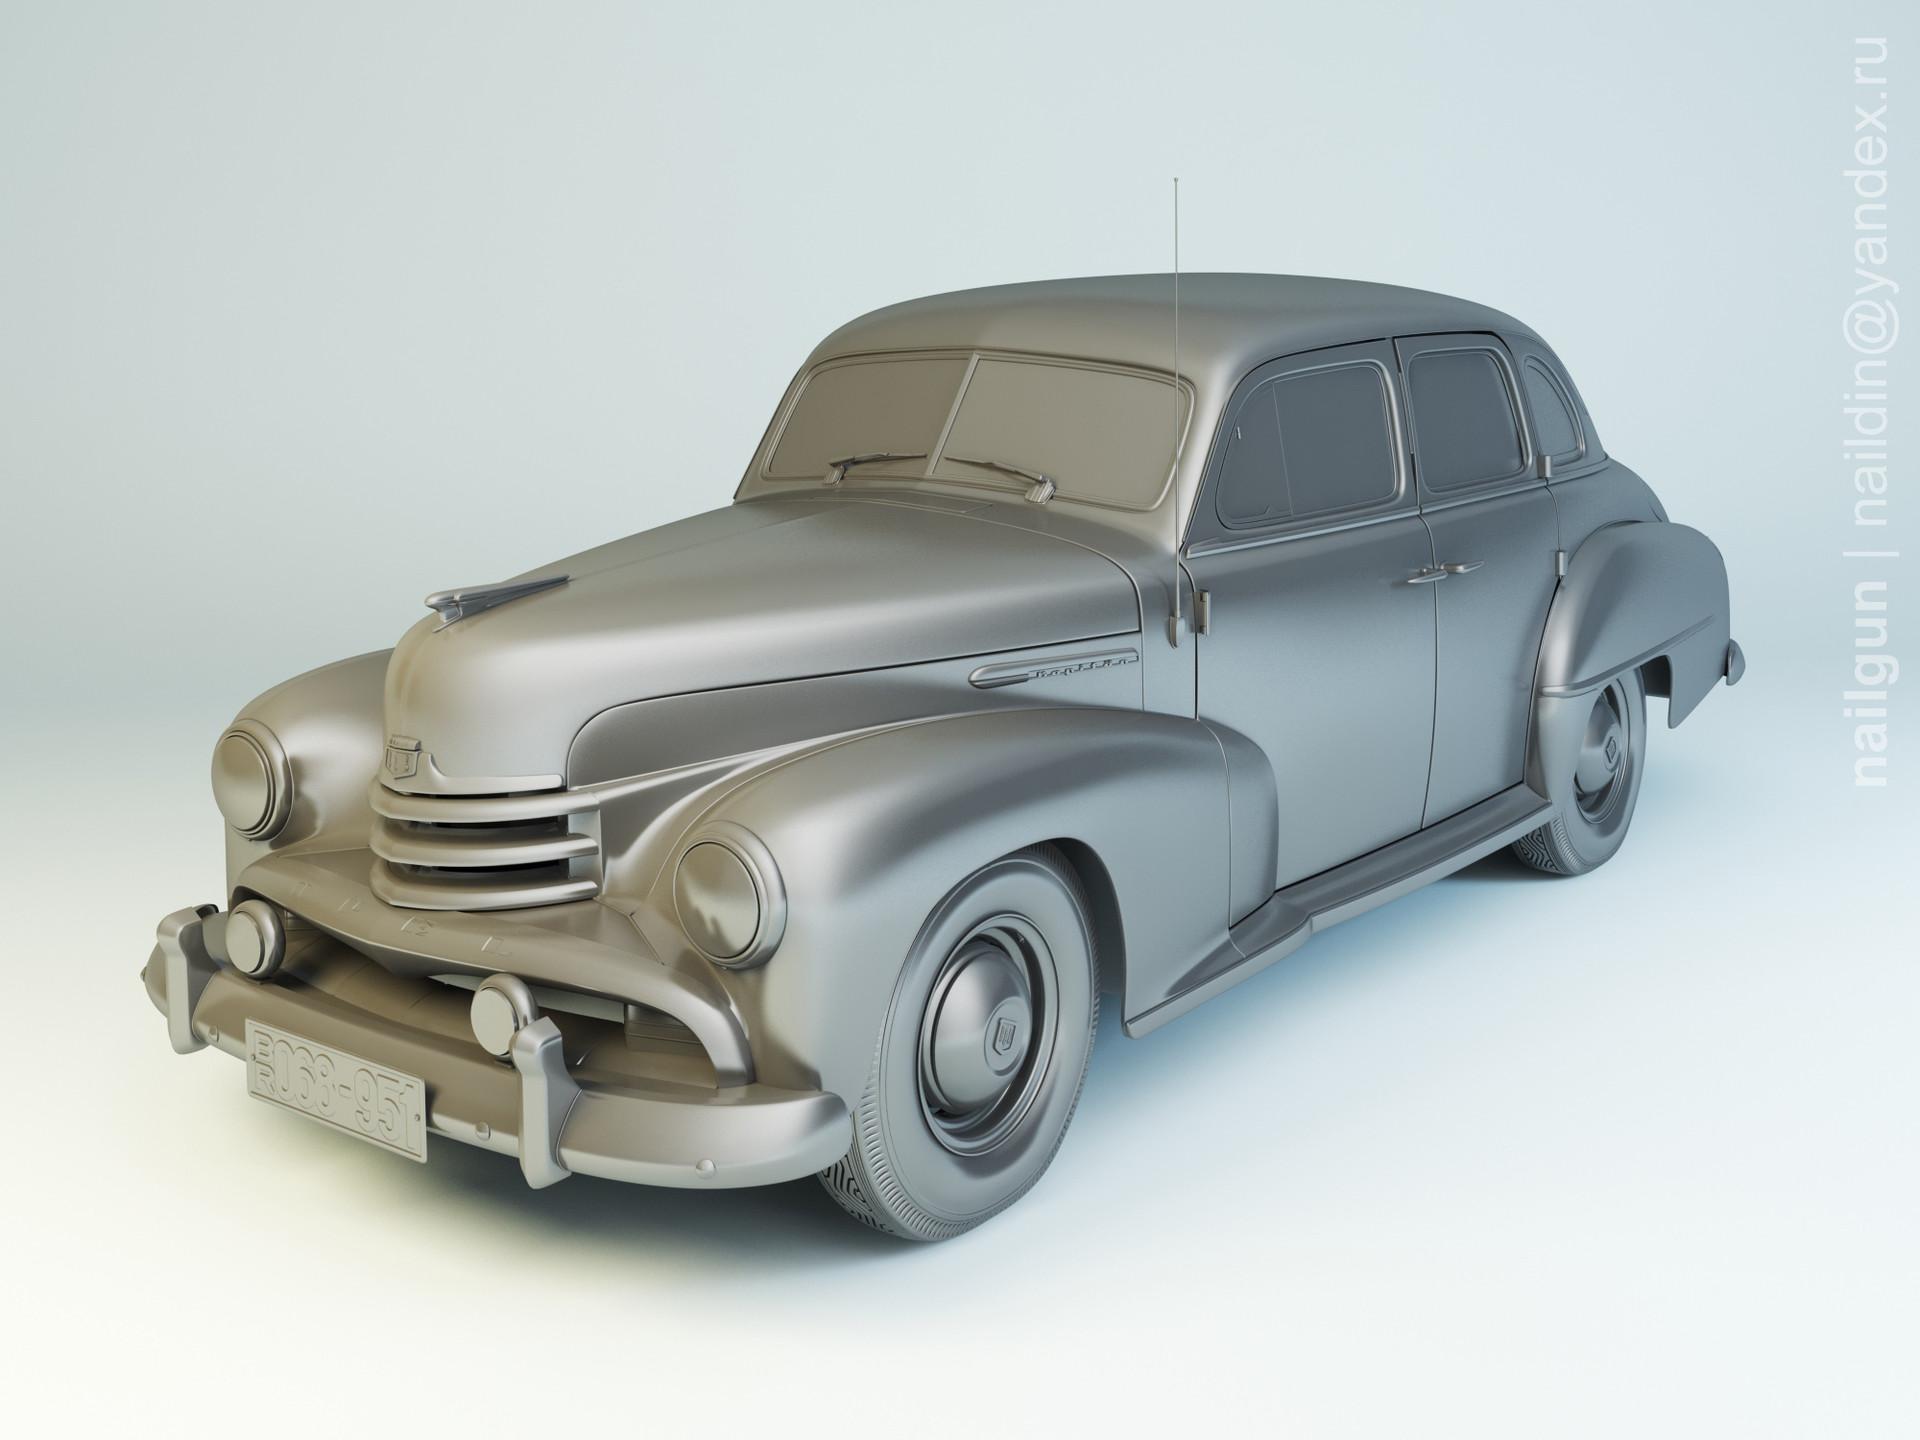 Nail khusnutdinov pwc 068 003 opel kapitan 1951 modelling 0